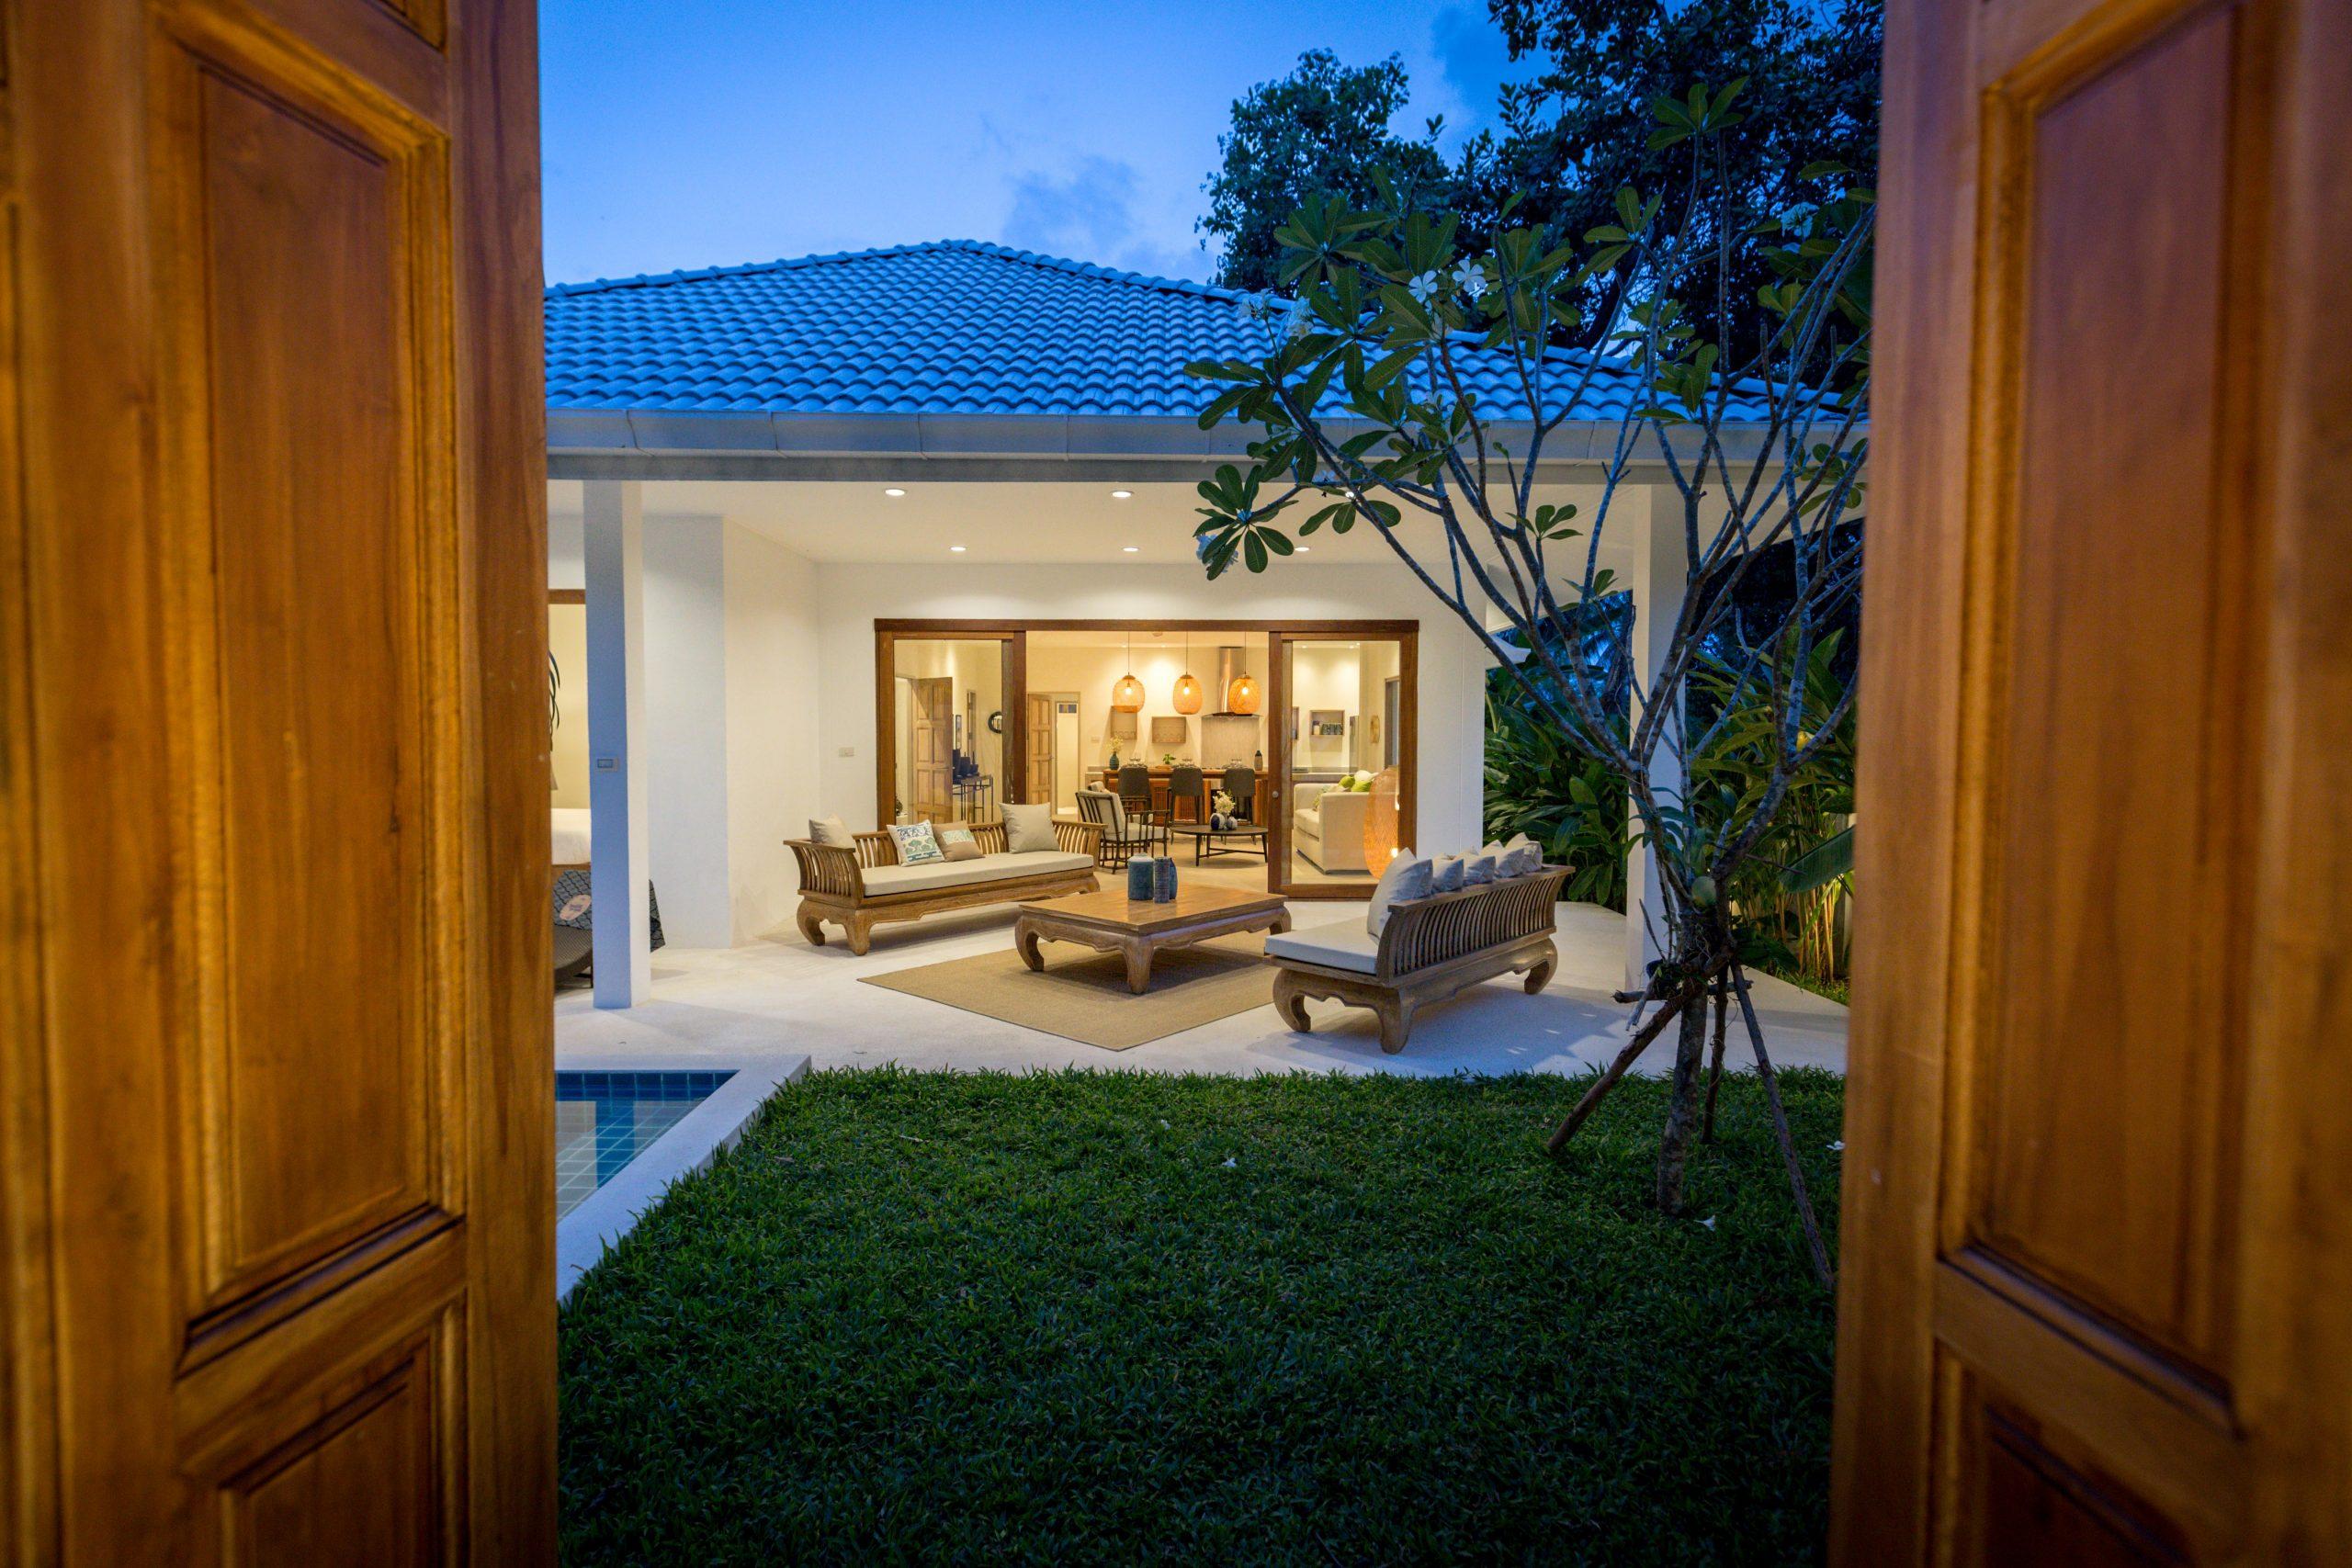 ana-villa-you-chill-we-work-koh-samui-thailand-conciergerie-concierge-service-villa-for-rent-for-sale-luxury